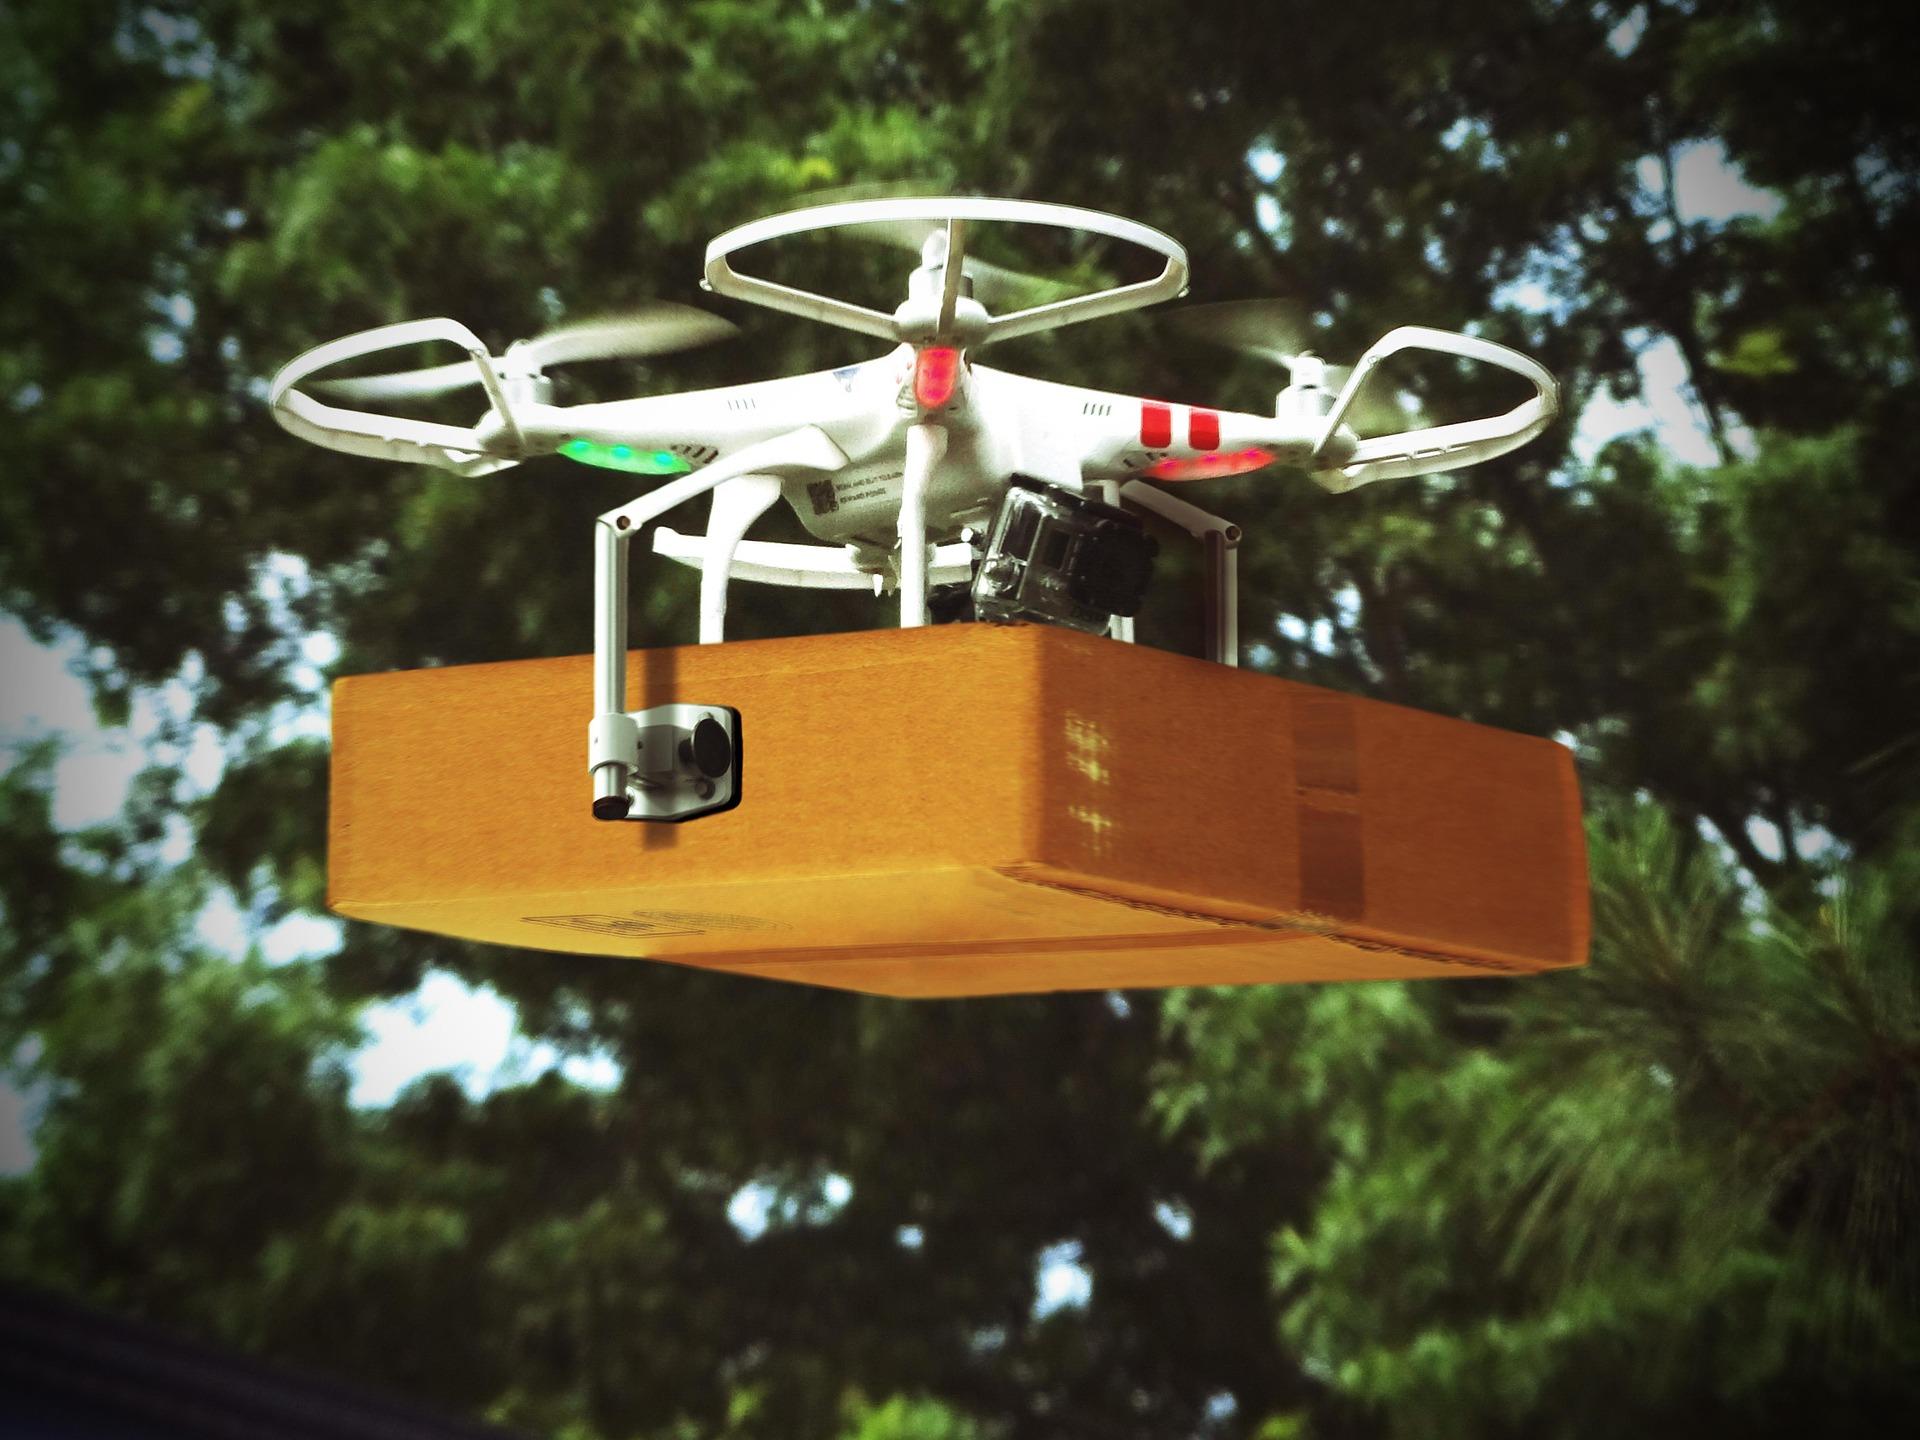 the-drones-1134764_1920.jpg